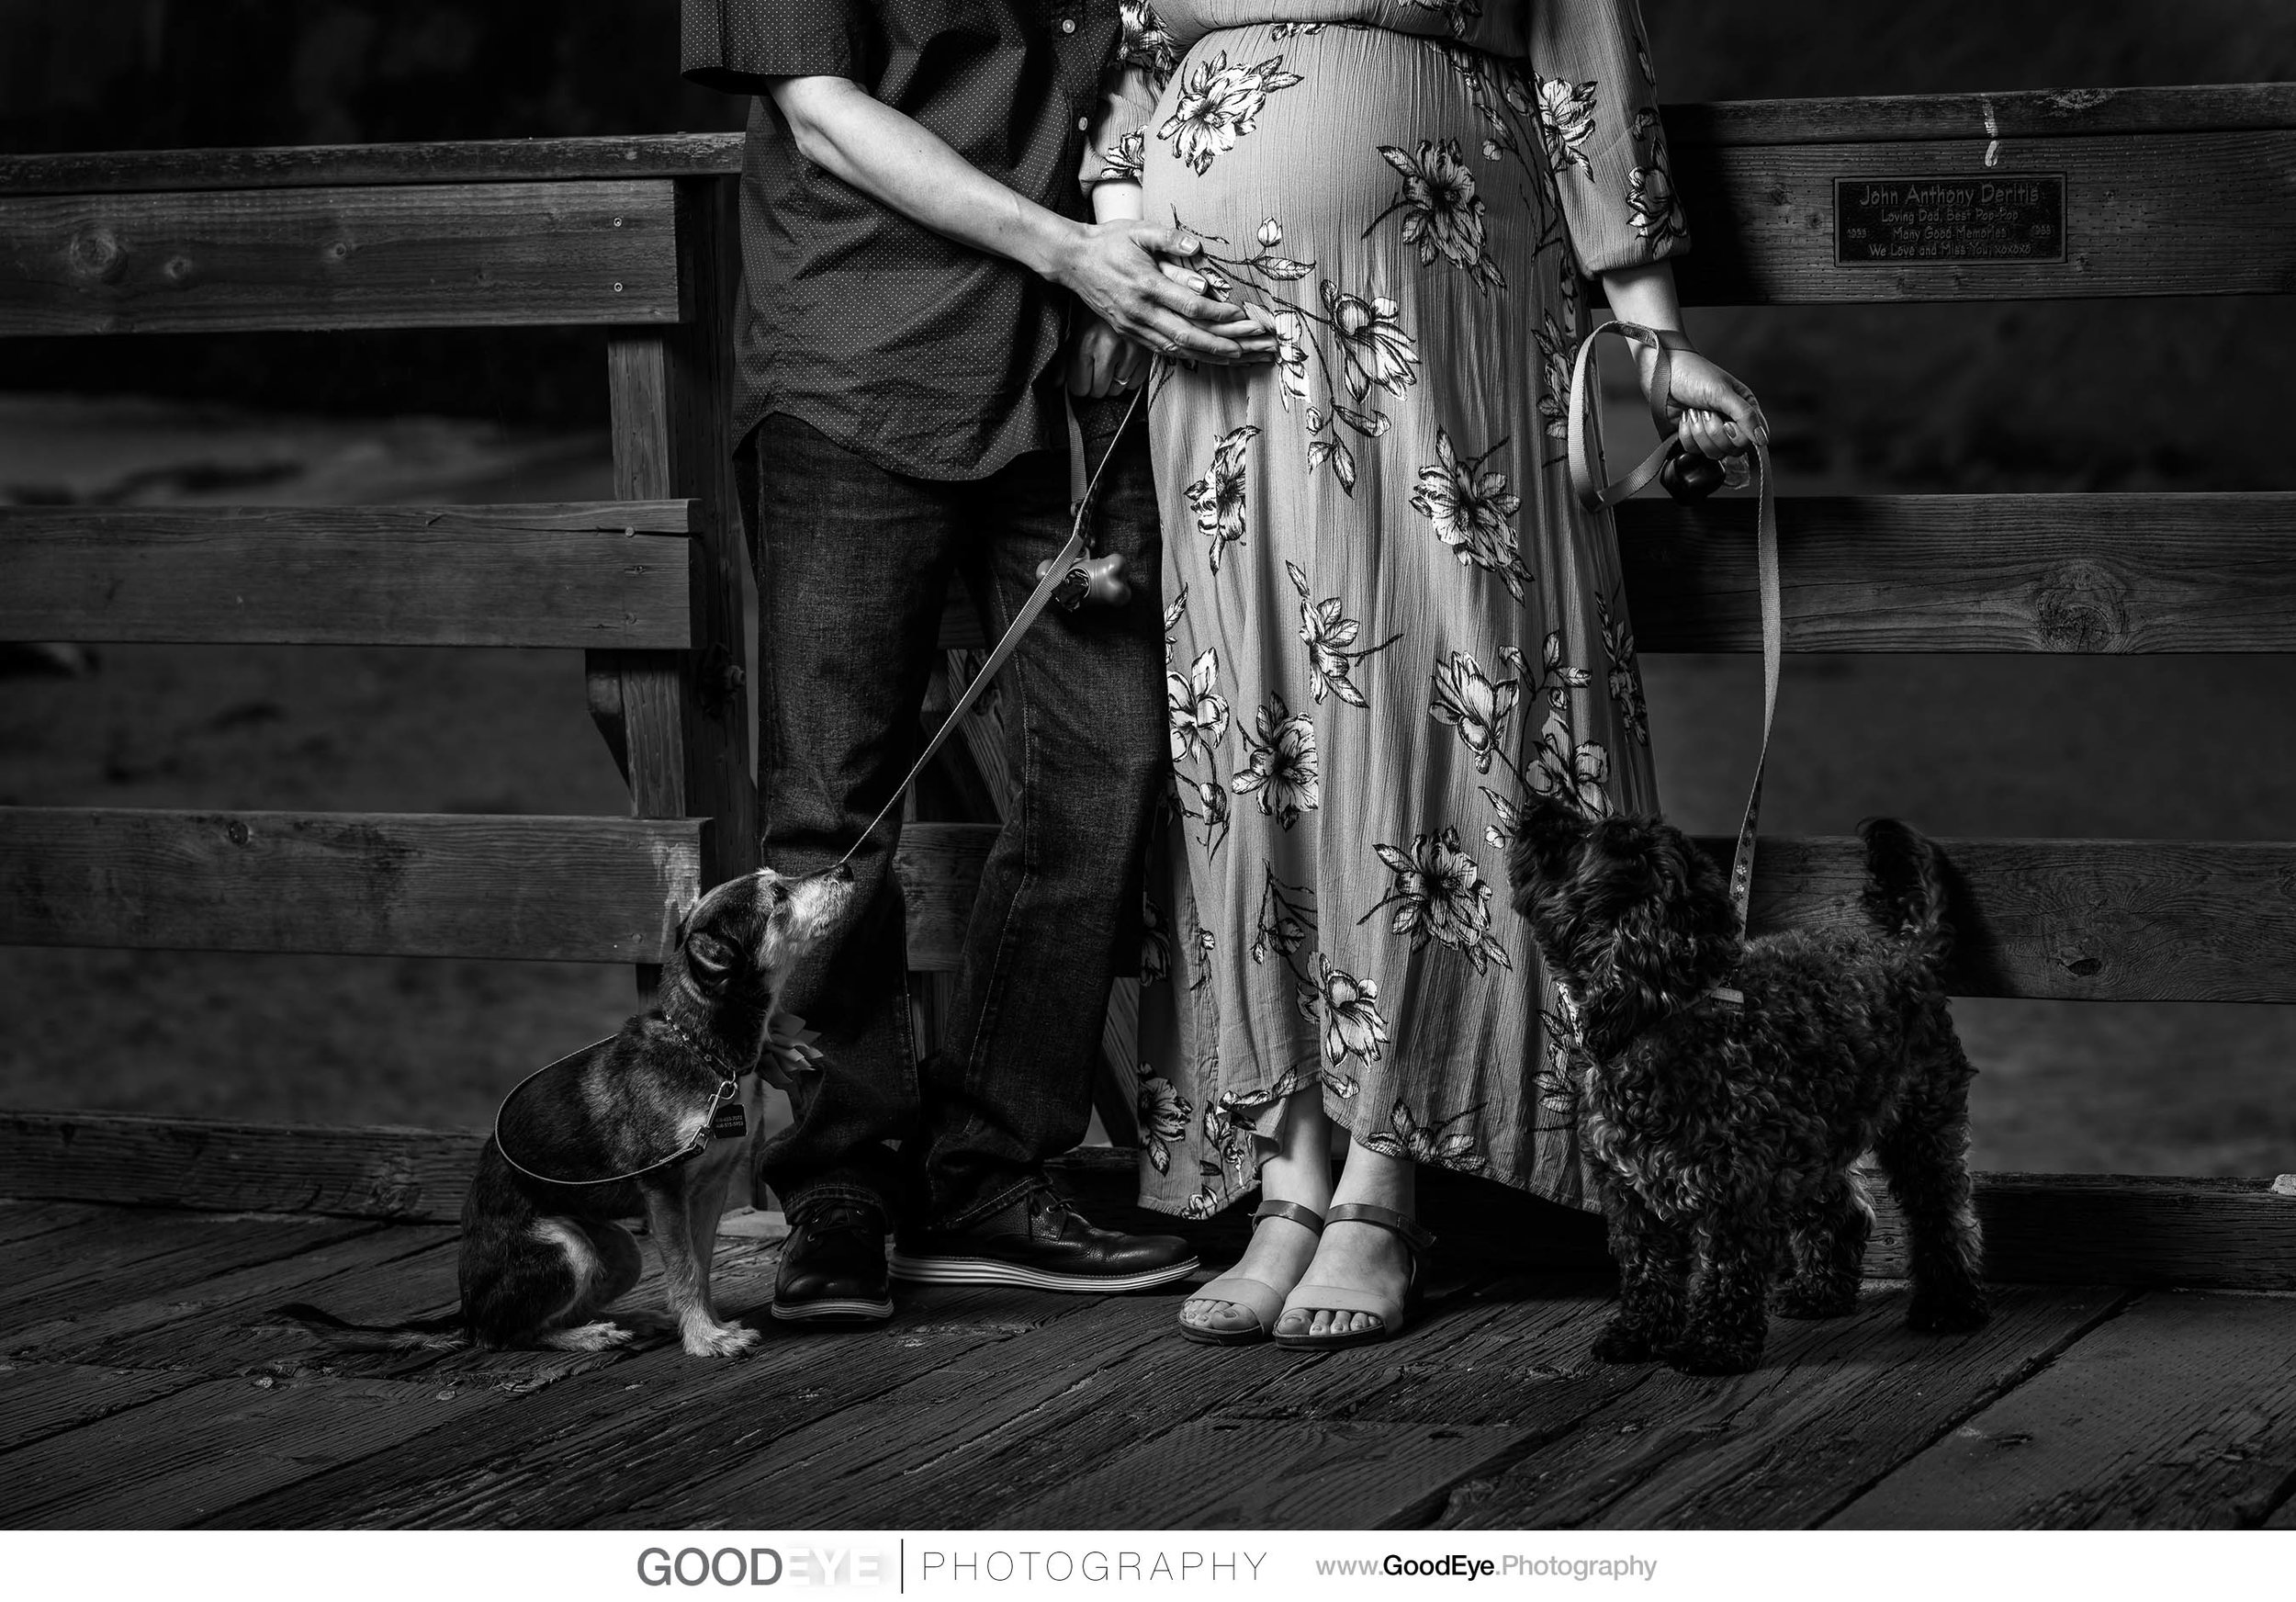 Capitola Beach Maternity Photos - by Bay Area portrait photograp